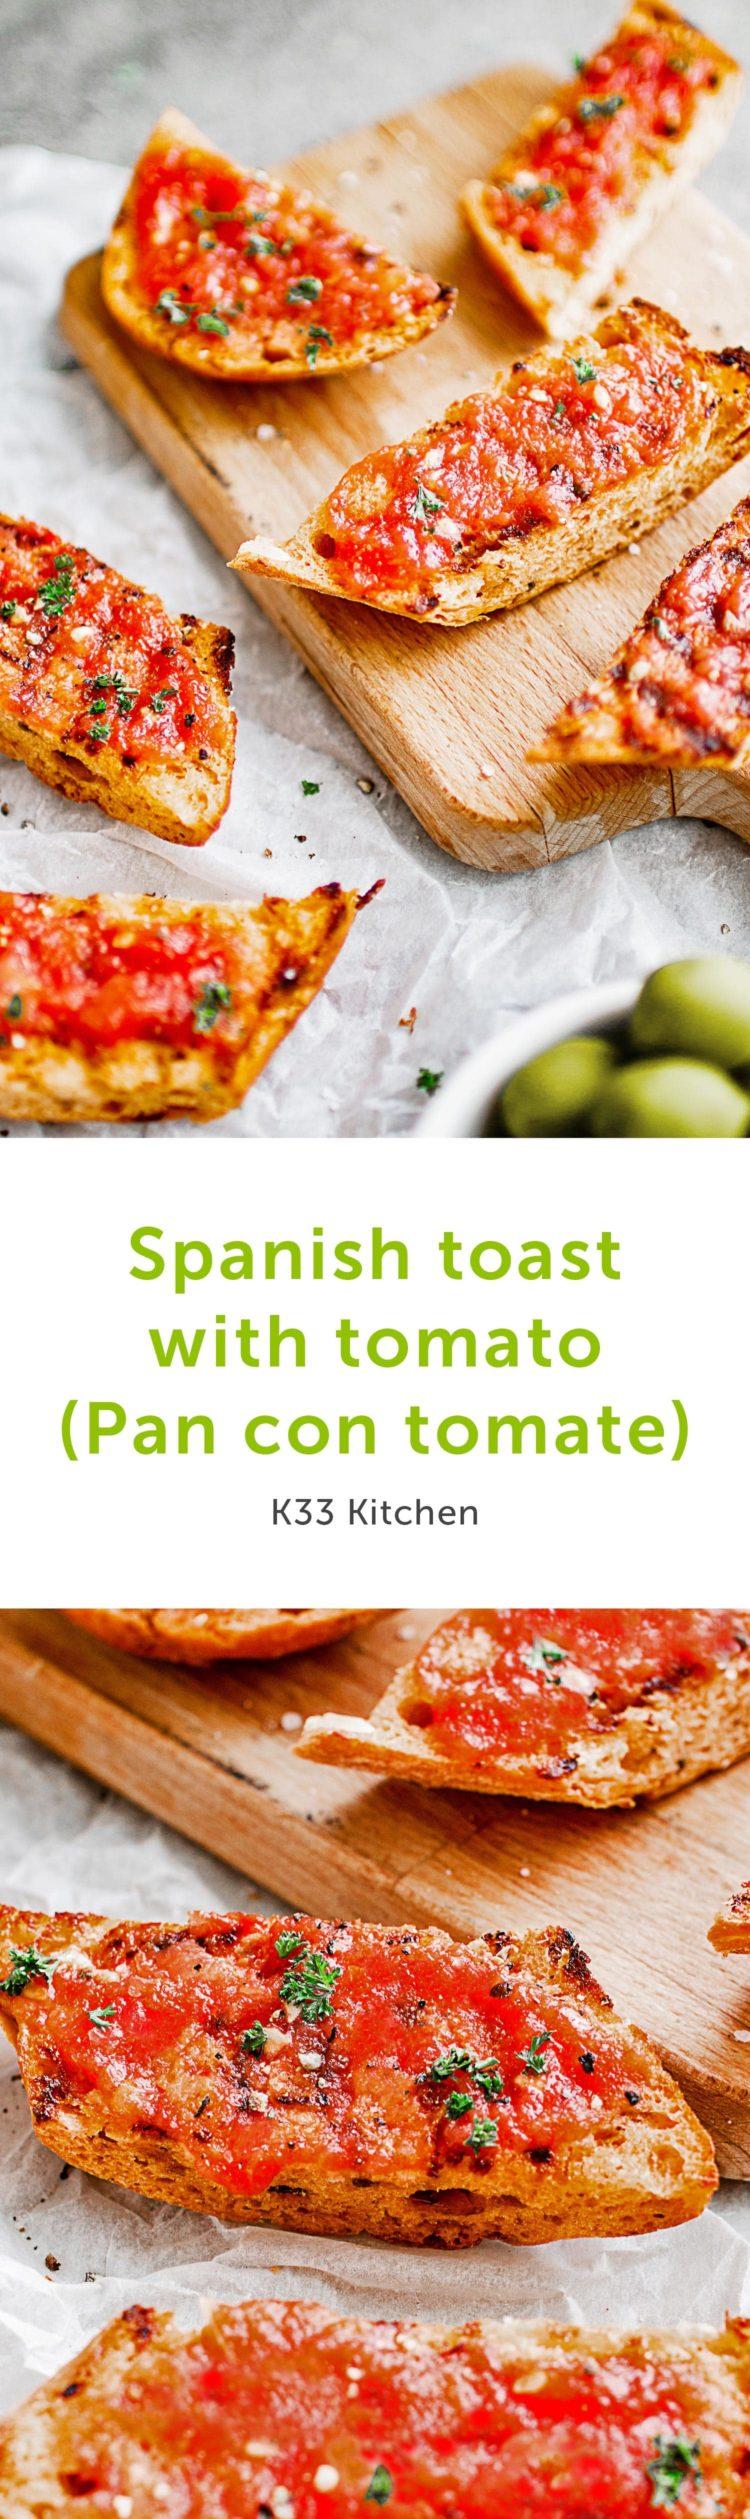 Spanish toast with tomato